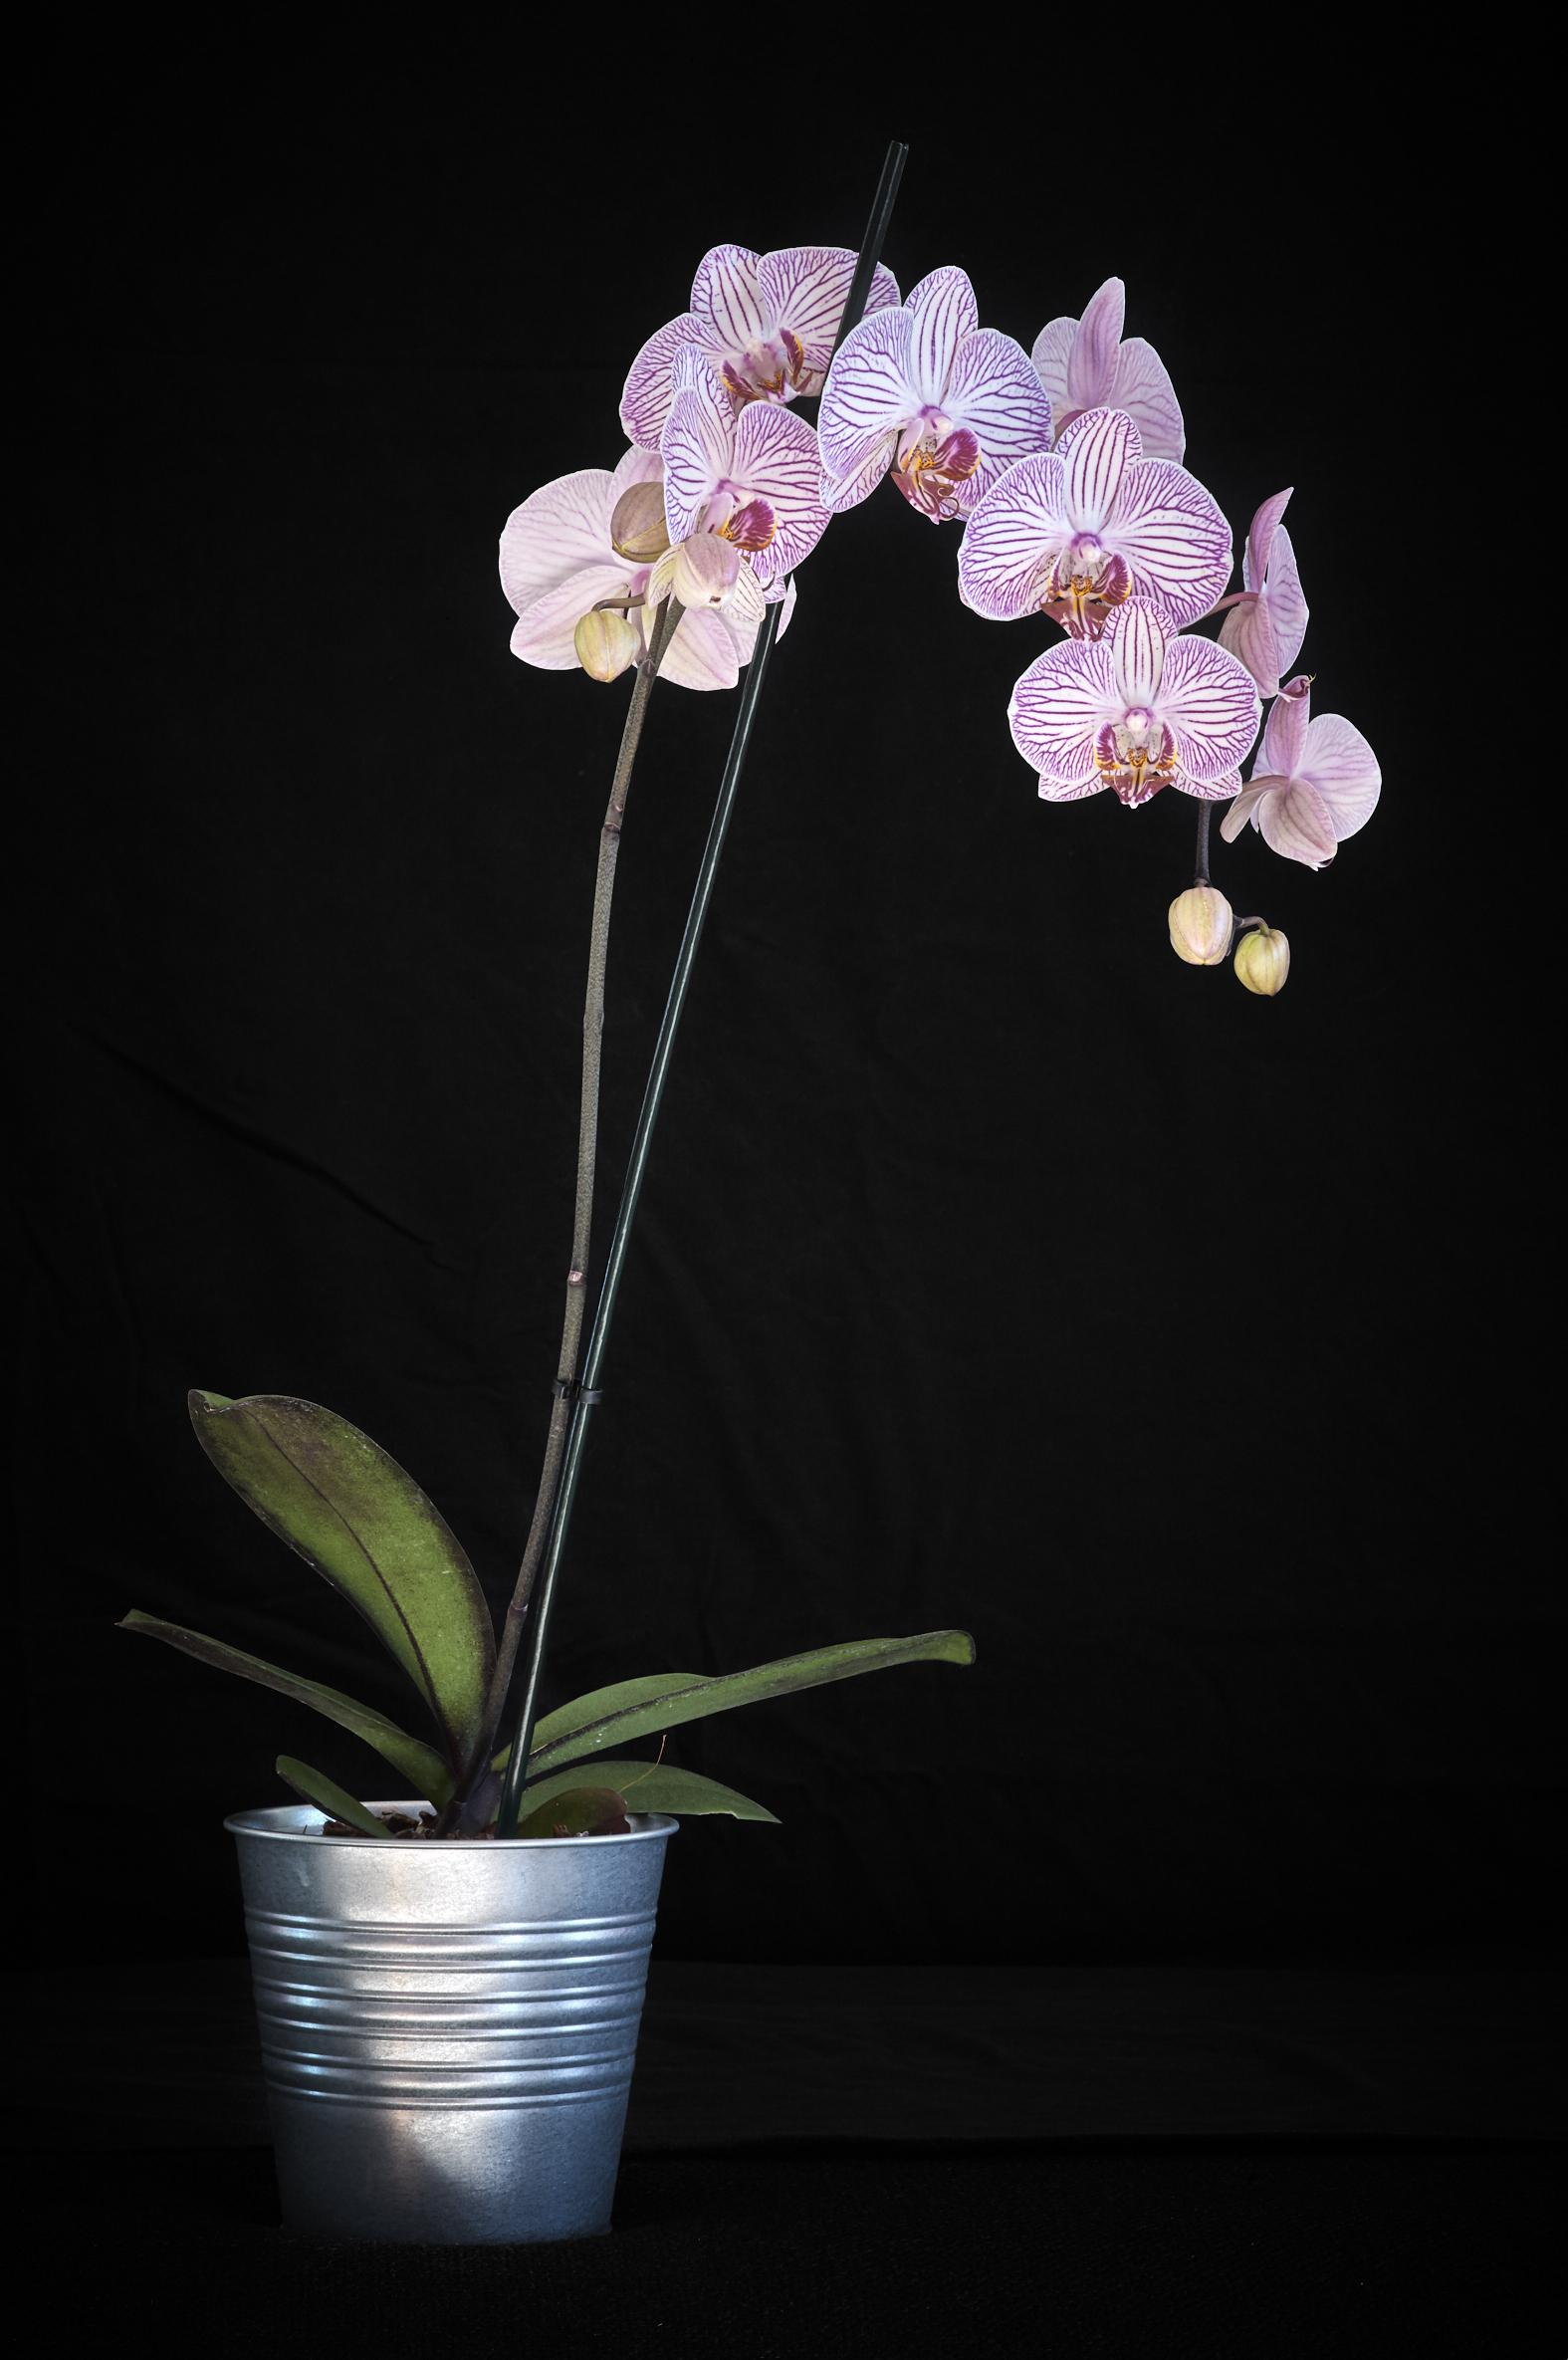 Orchidée Phalaenopsis - Janvier 2019